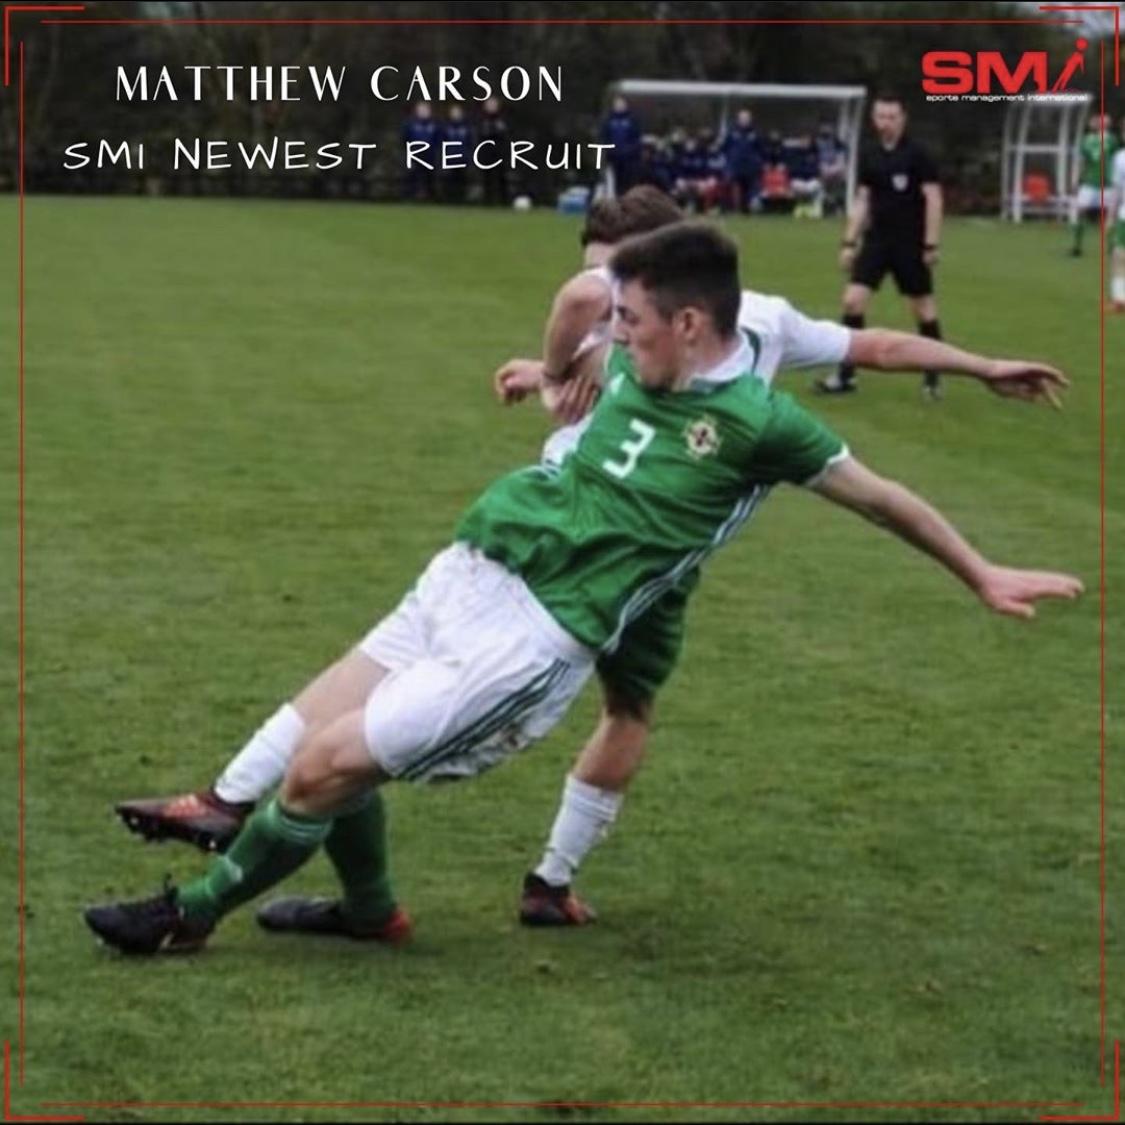 SMI new recruit Matthew Carson